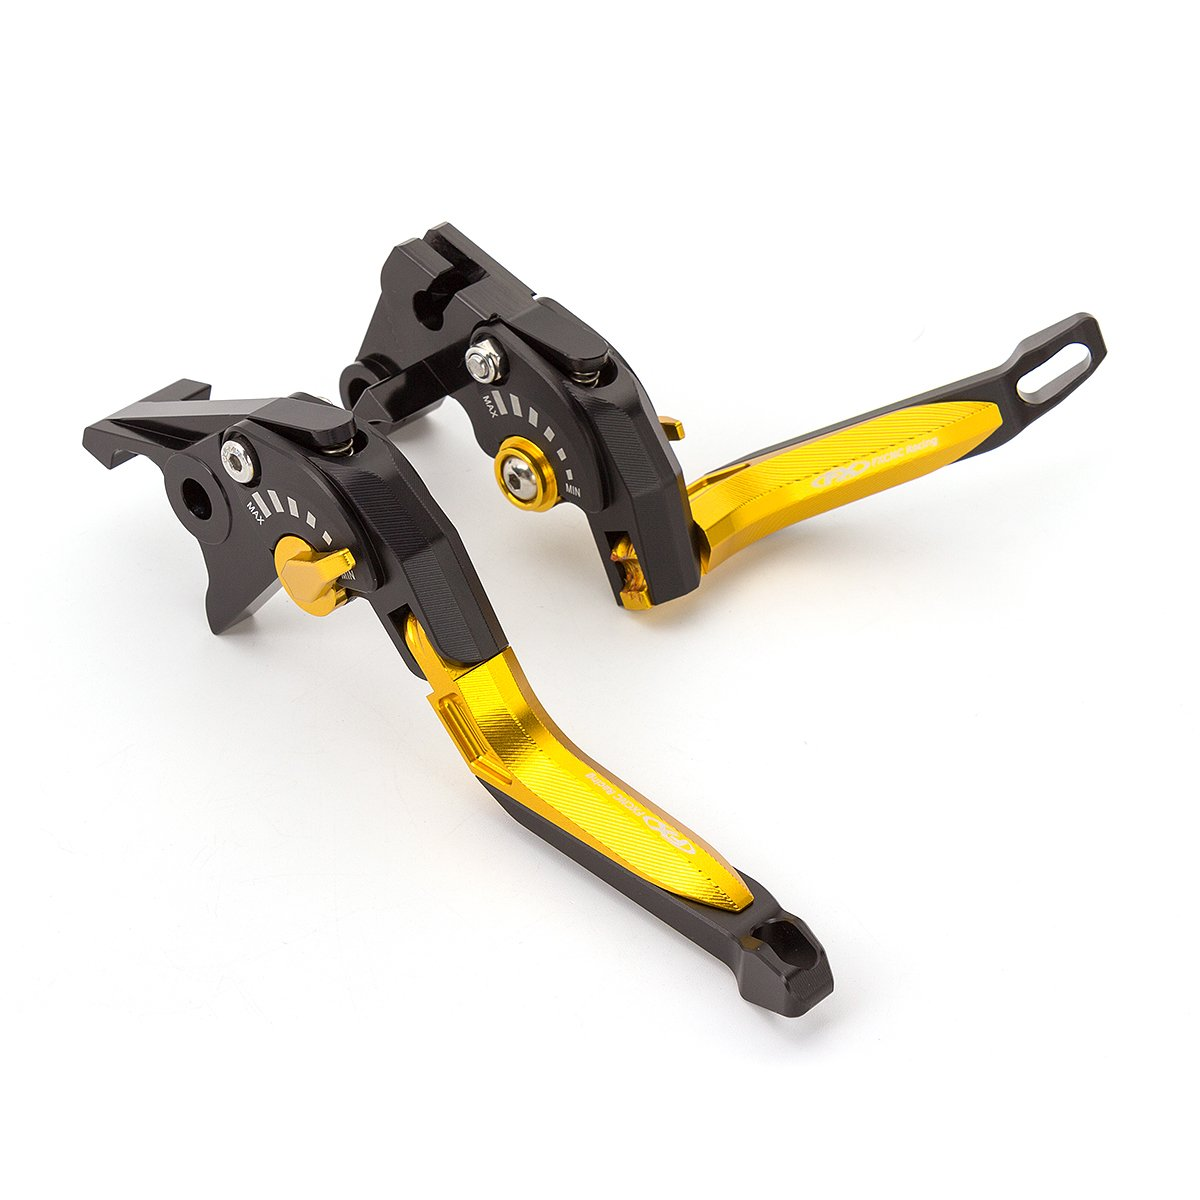 FXCNC CNC Racing 3D Rhombus Fringe Folding Extending Adjustable Brake Clutch Levers Set Pair Fit For BMW K1200R SPORT, K1200S, R1200R, R1200RT/SE, R1200S, R1200ST, R1200GS